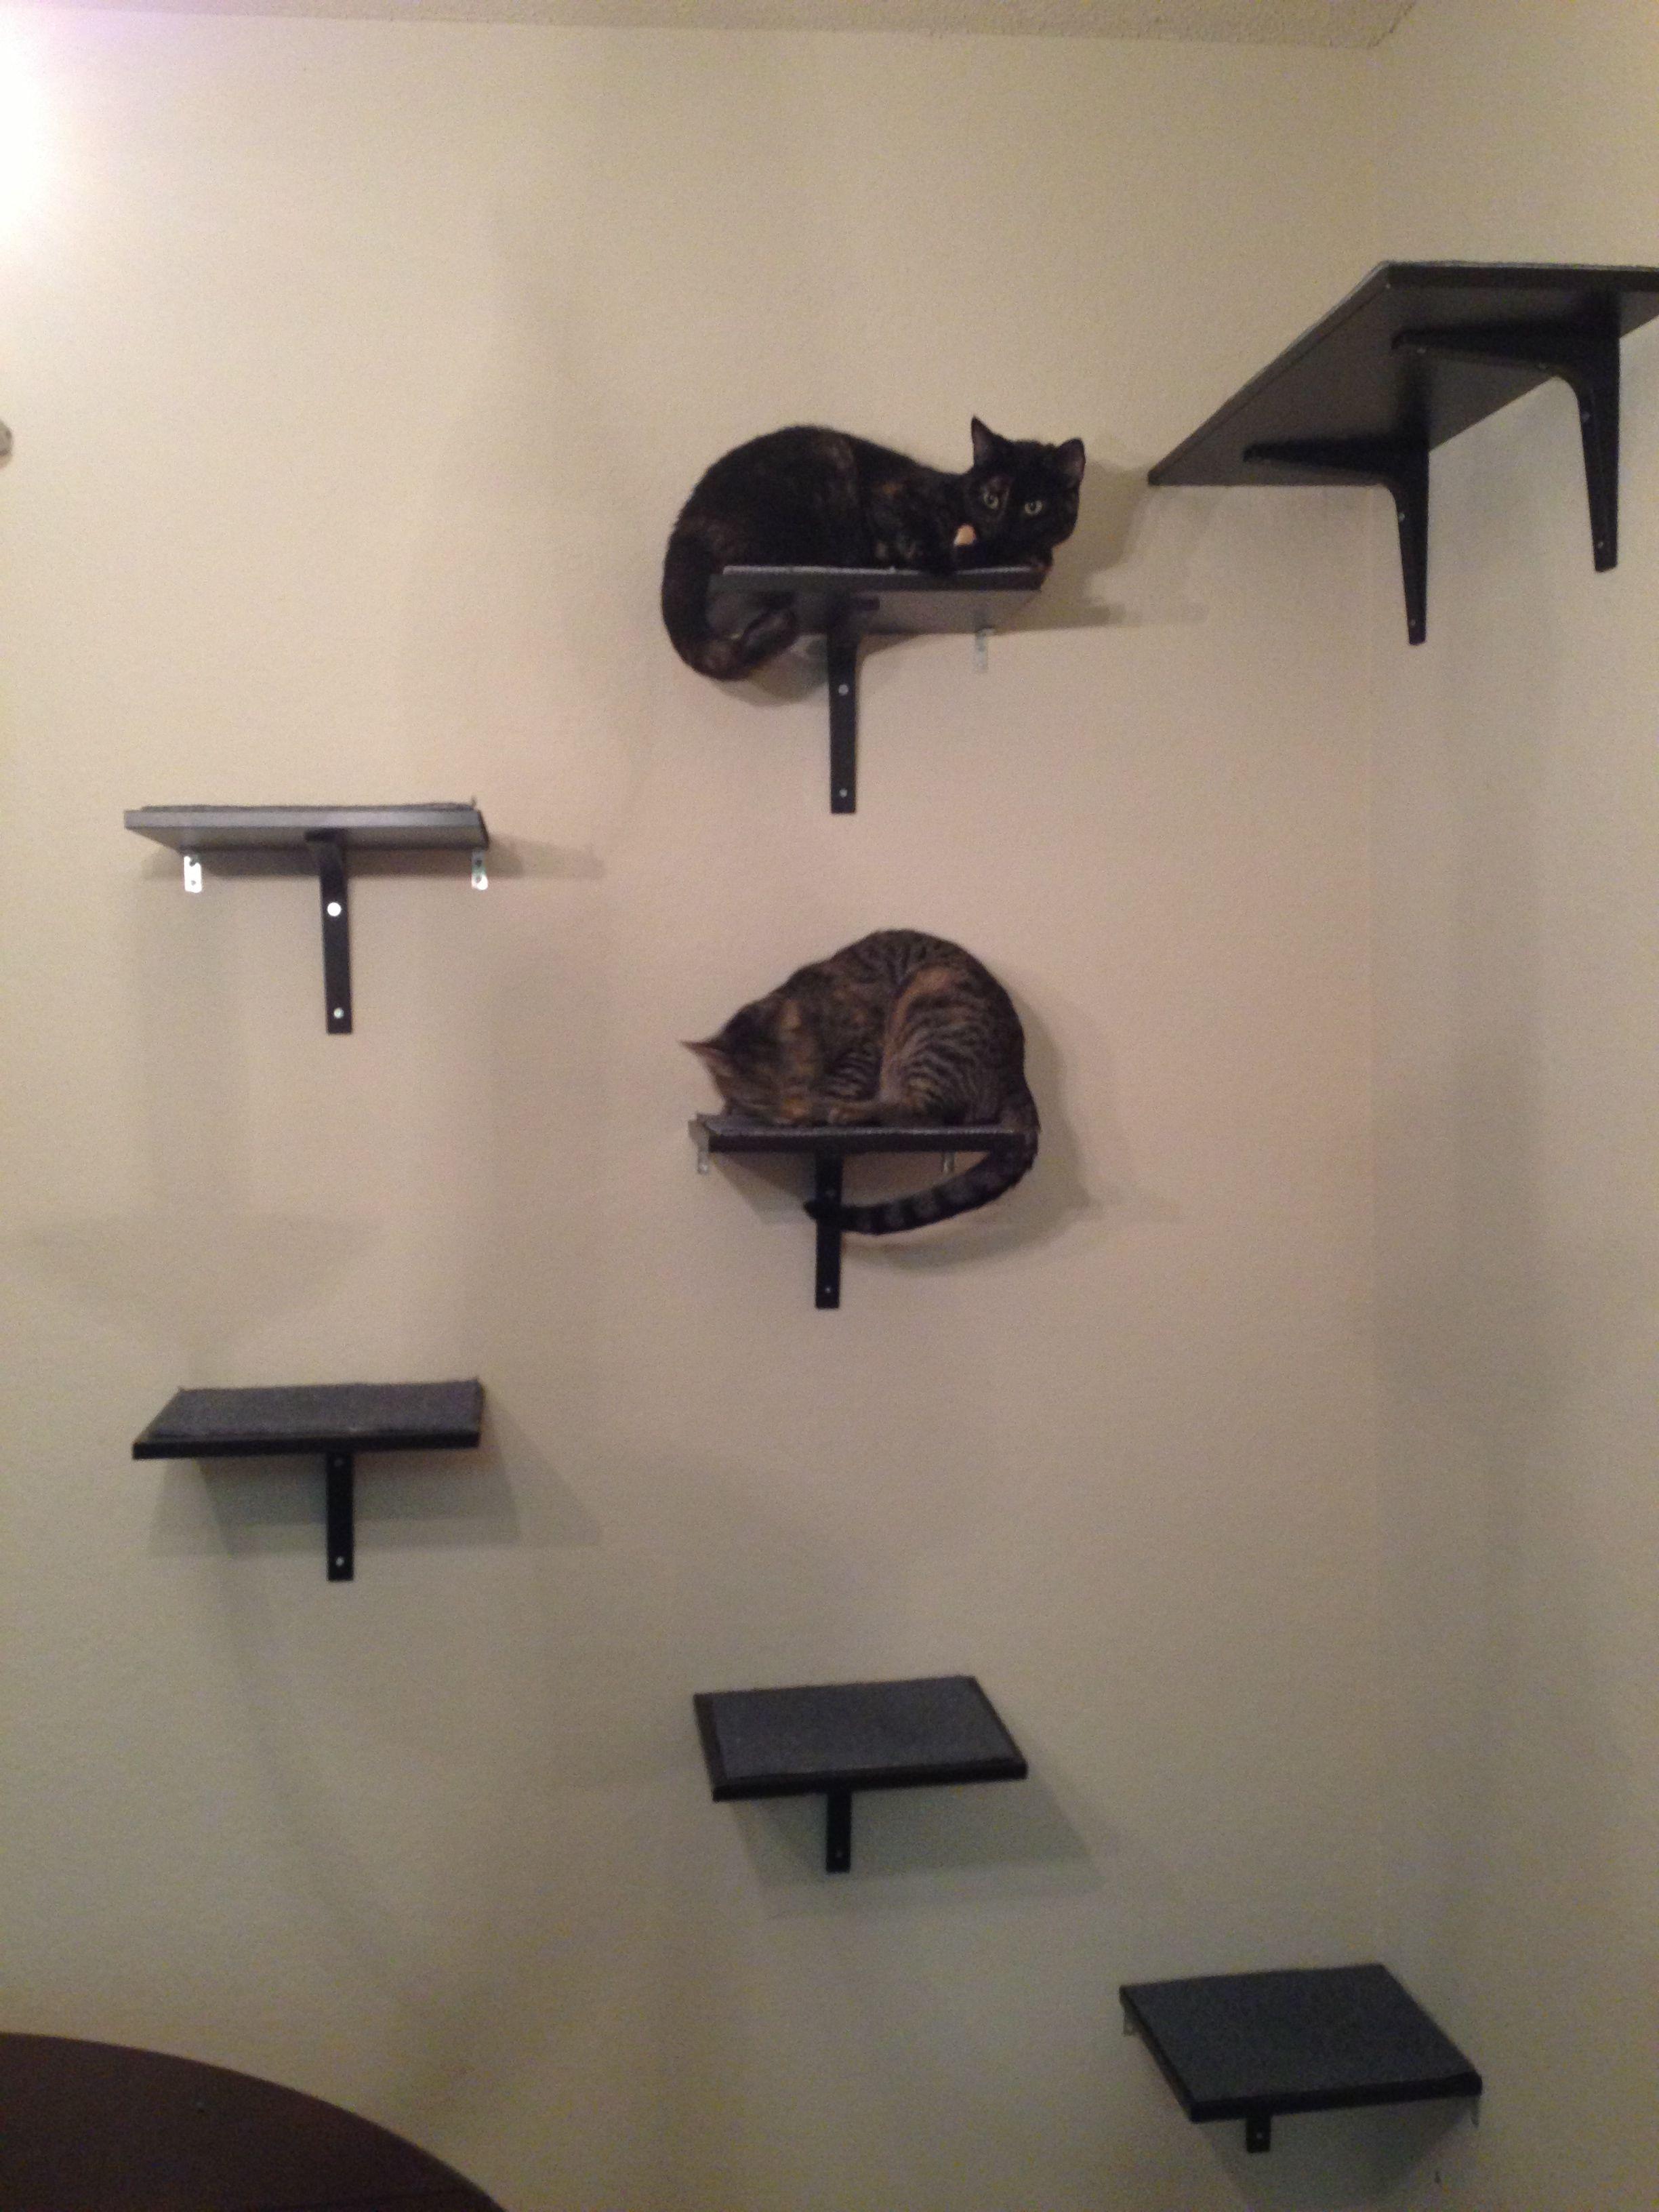 Ikea hack cat shelves Cat shelves, Animal room, Cat room